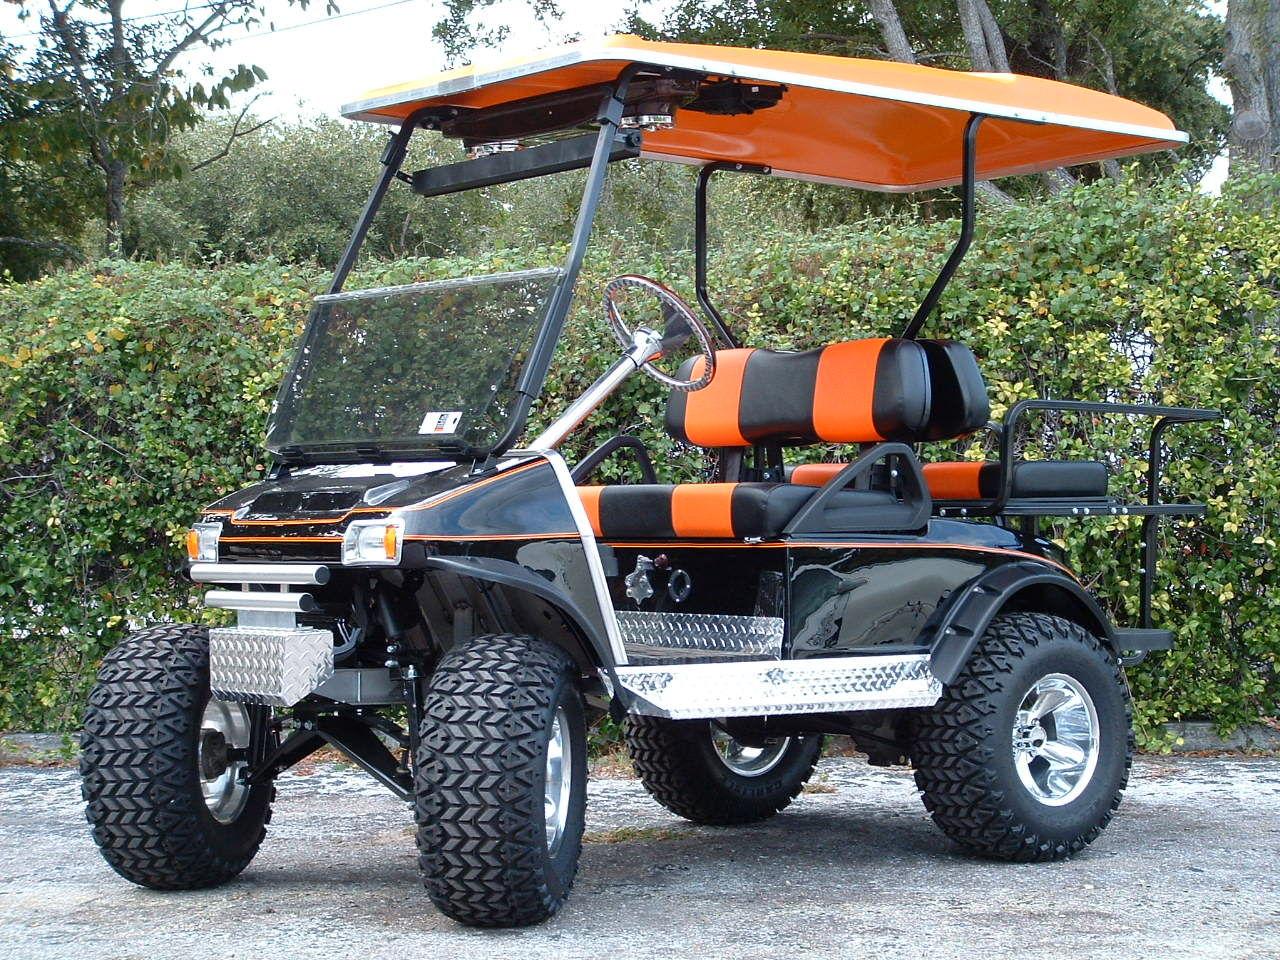 P 004W006040280003P as well 221228312165 further Golfcartseats as well Golf Bag Holder additionally Carros De Golf. on golf cart bag canopy